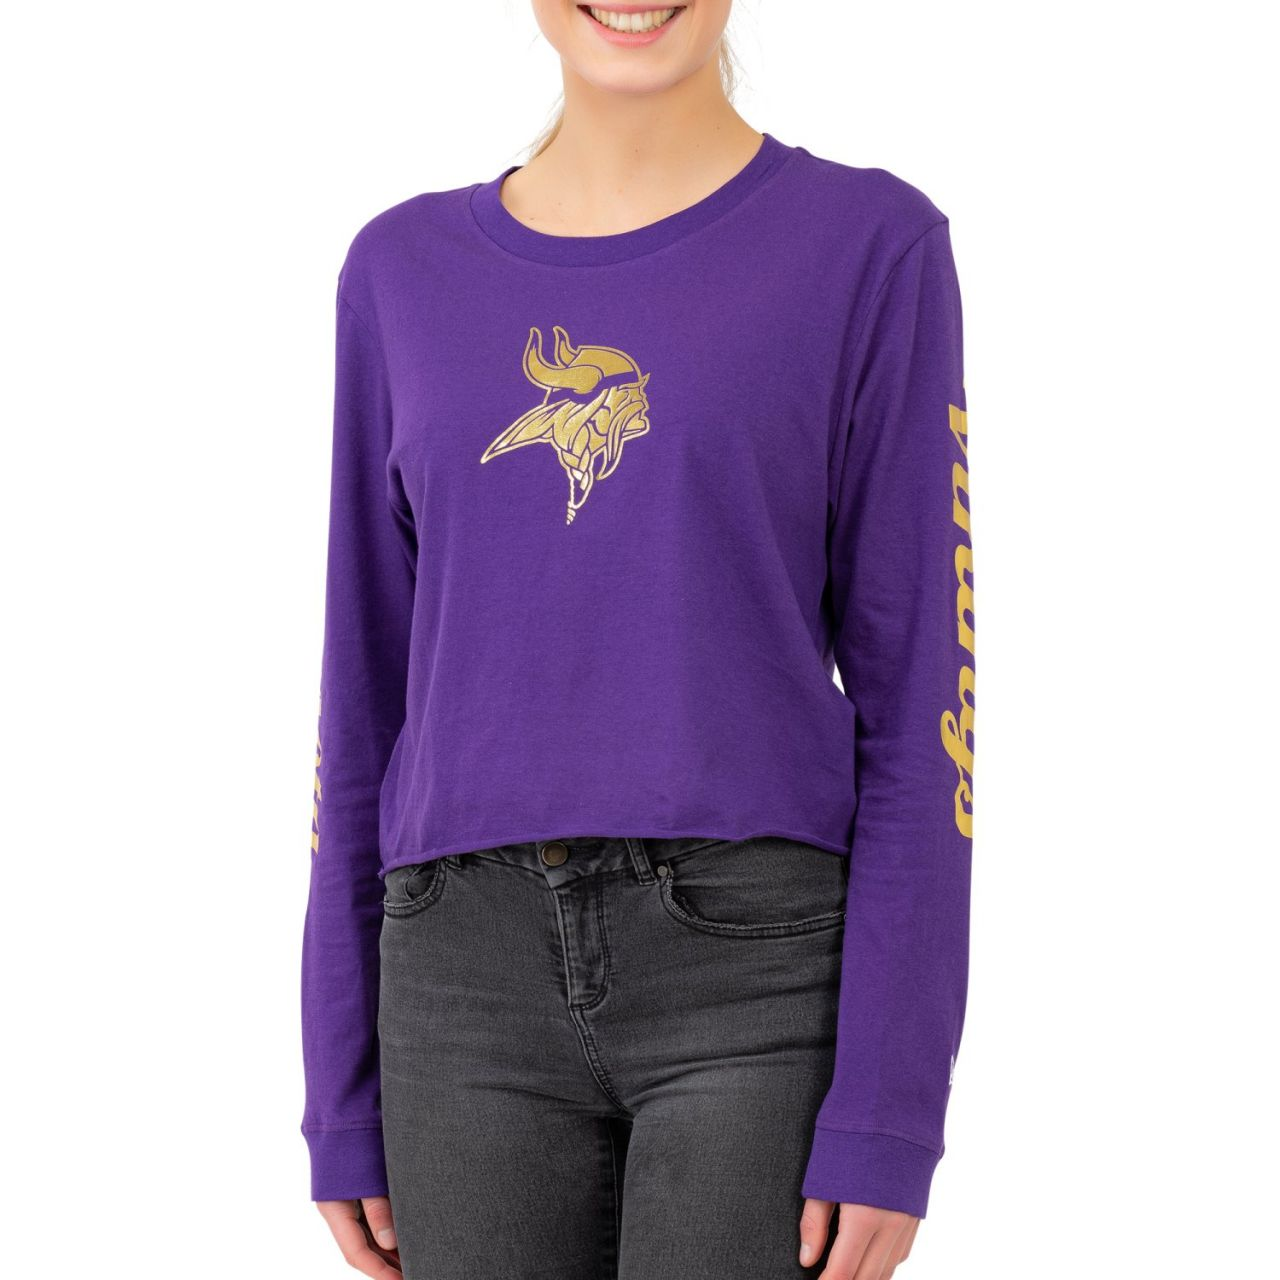 amfoo - New Era NFL Damen Cropped Longsleeve - Minnesota Vikings